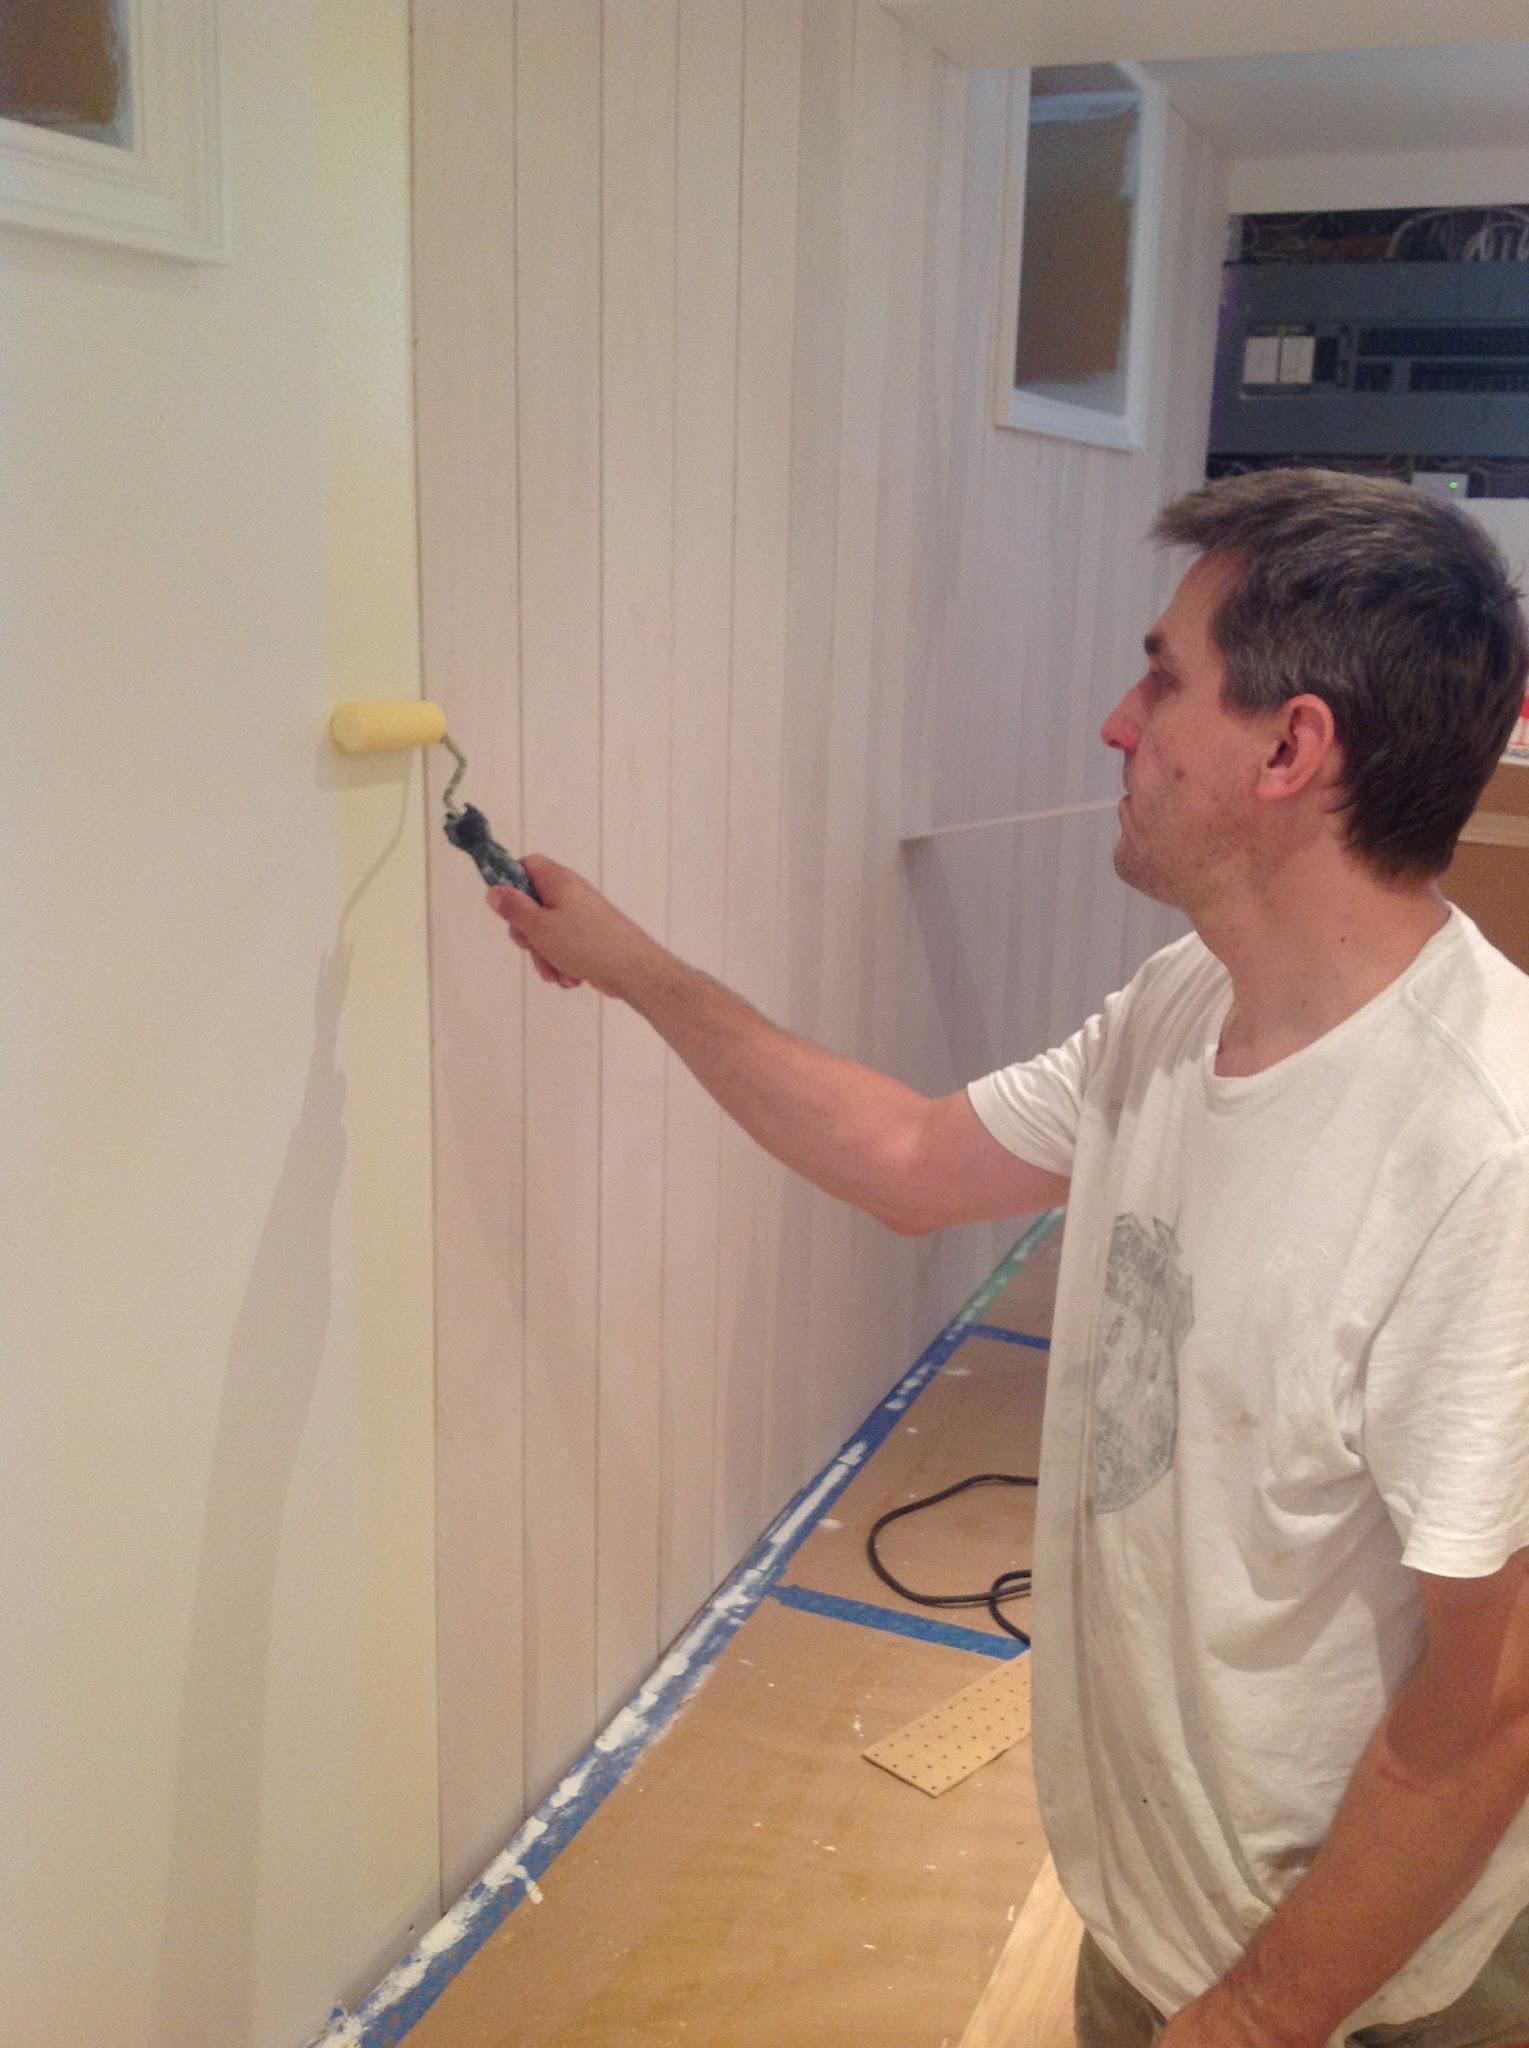 diy whitewash shiplap plank walls, plywood planks, whitewash wall planks